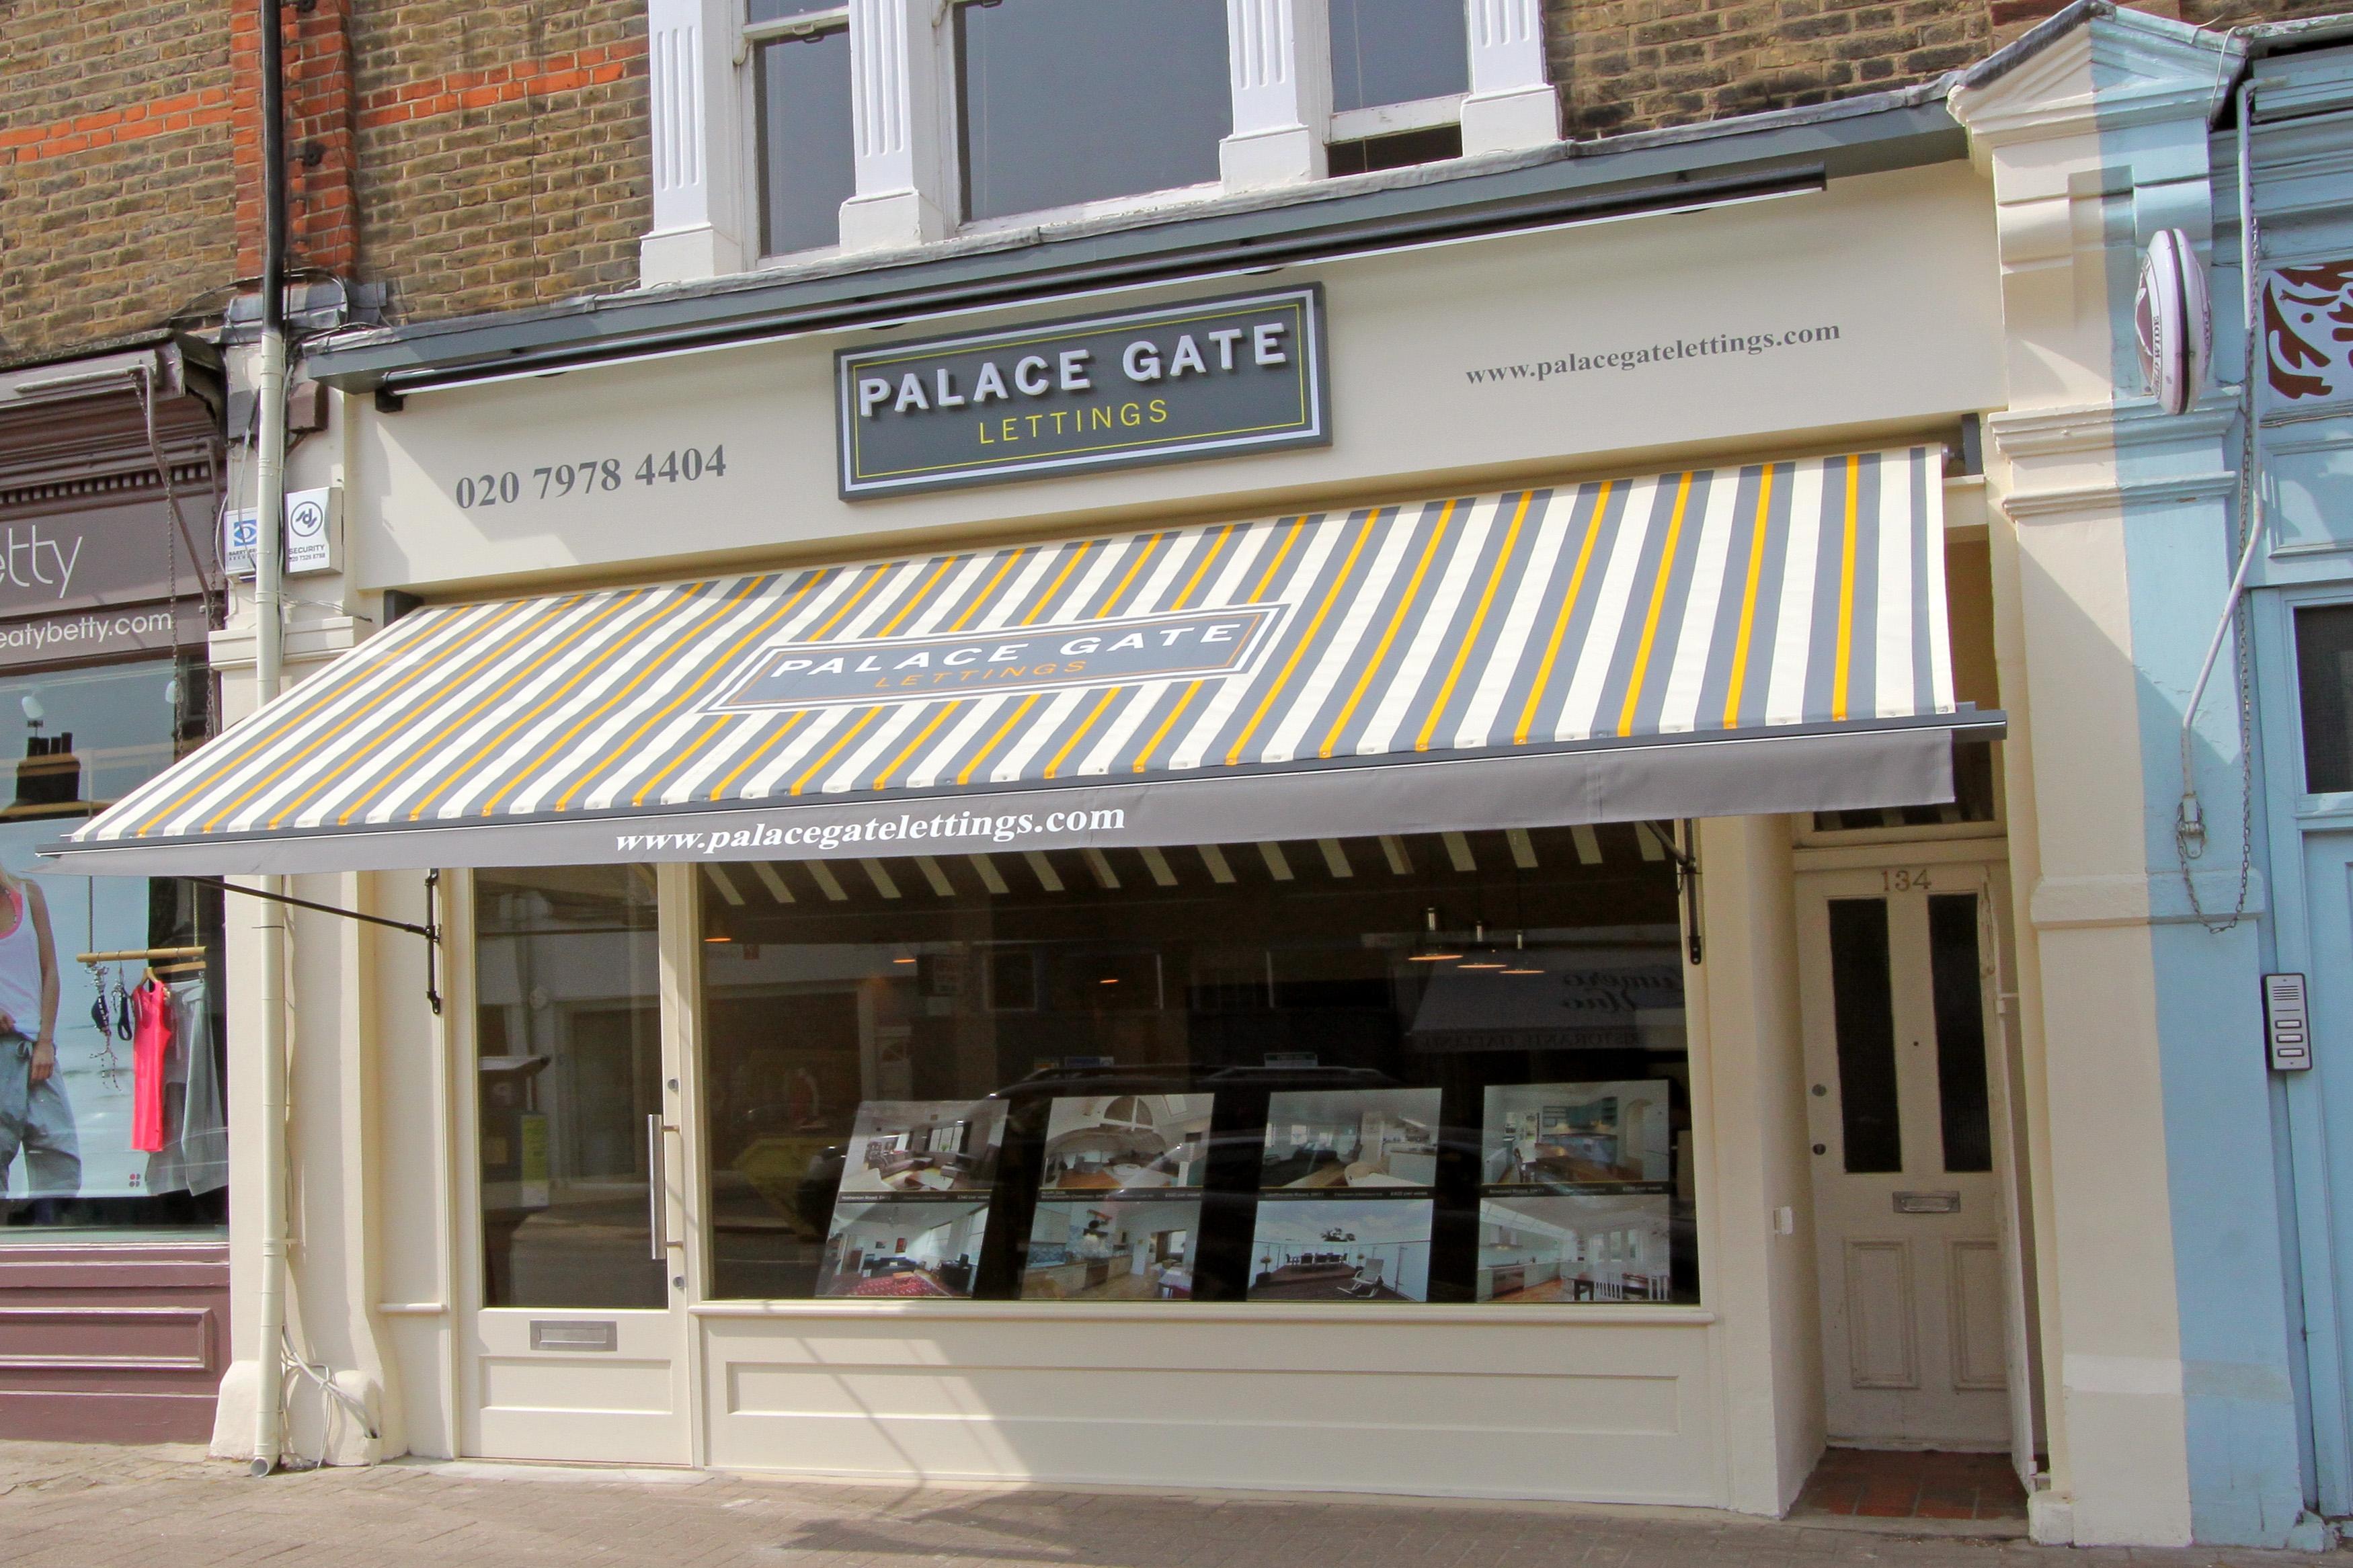 Palace Gate Lettings - Battersea, London SW11 6QZ - 020 7978 4404   ShowMeLocal.com